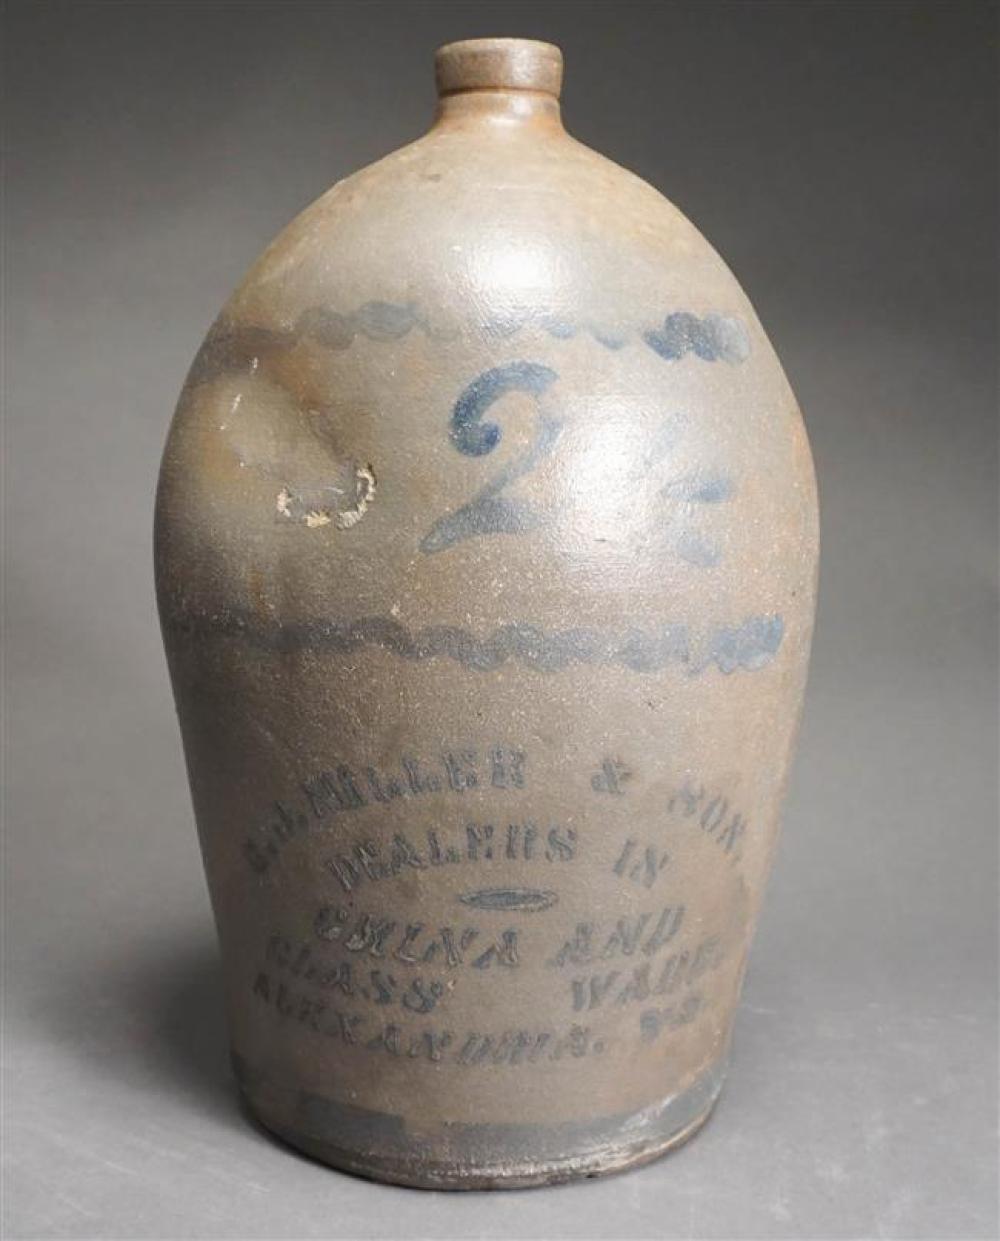 Alexandria Virginia Stoneware Two Gallon Jug, Height: 14 in